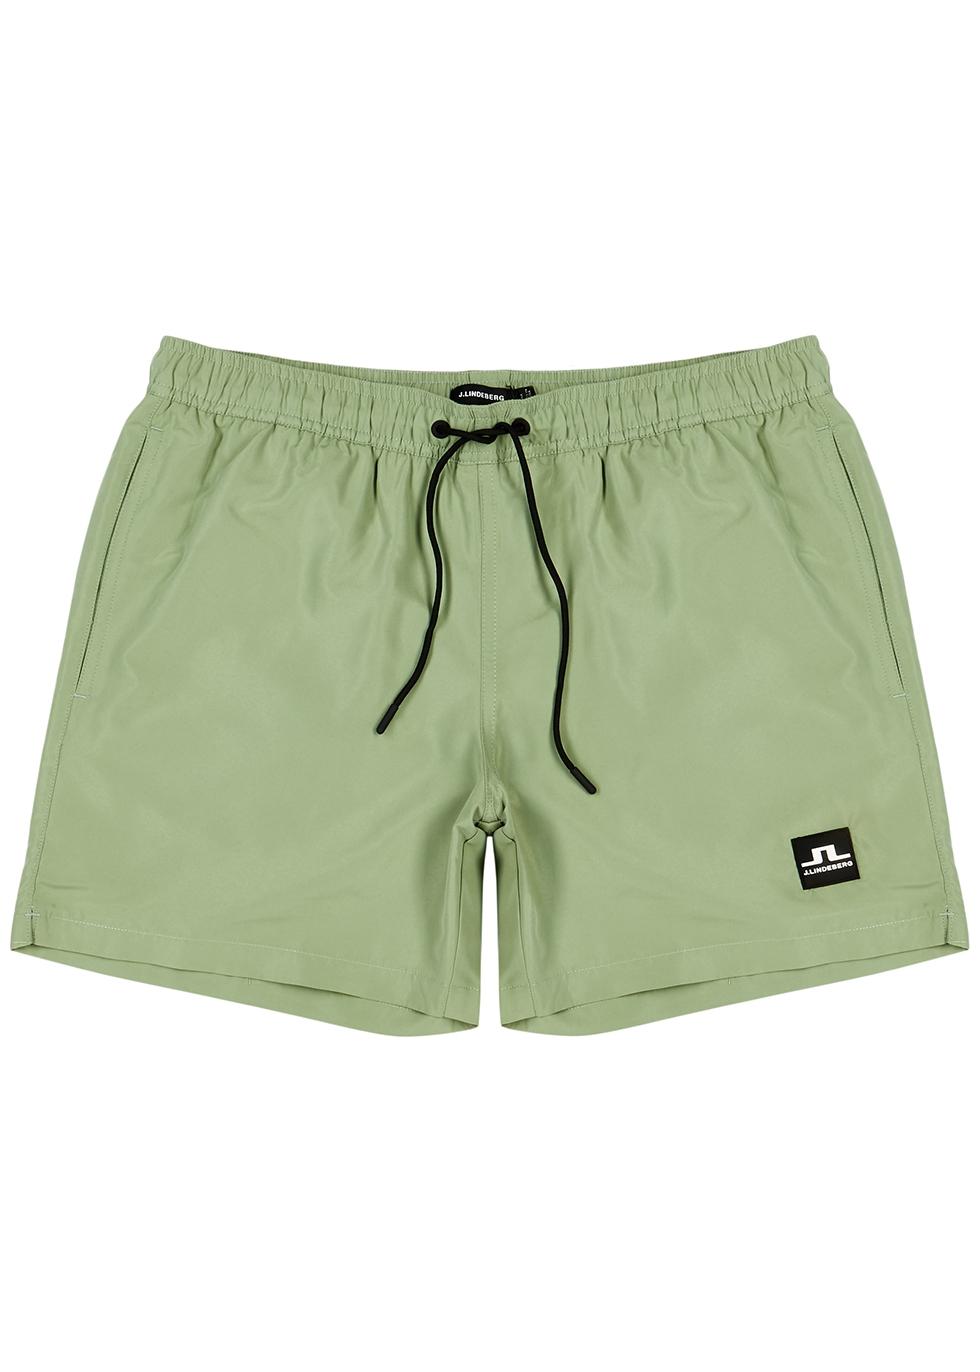 Banks sage shell swim shorts